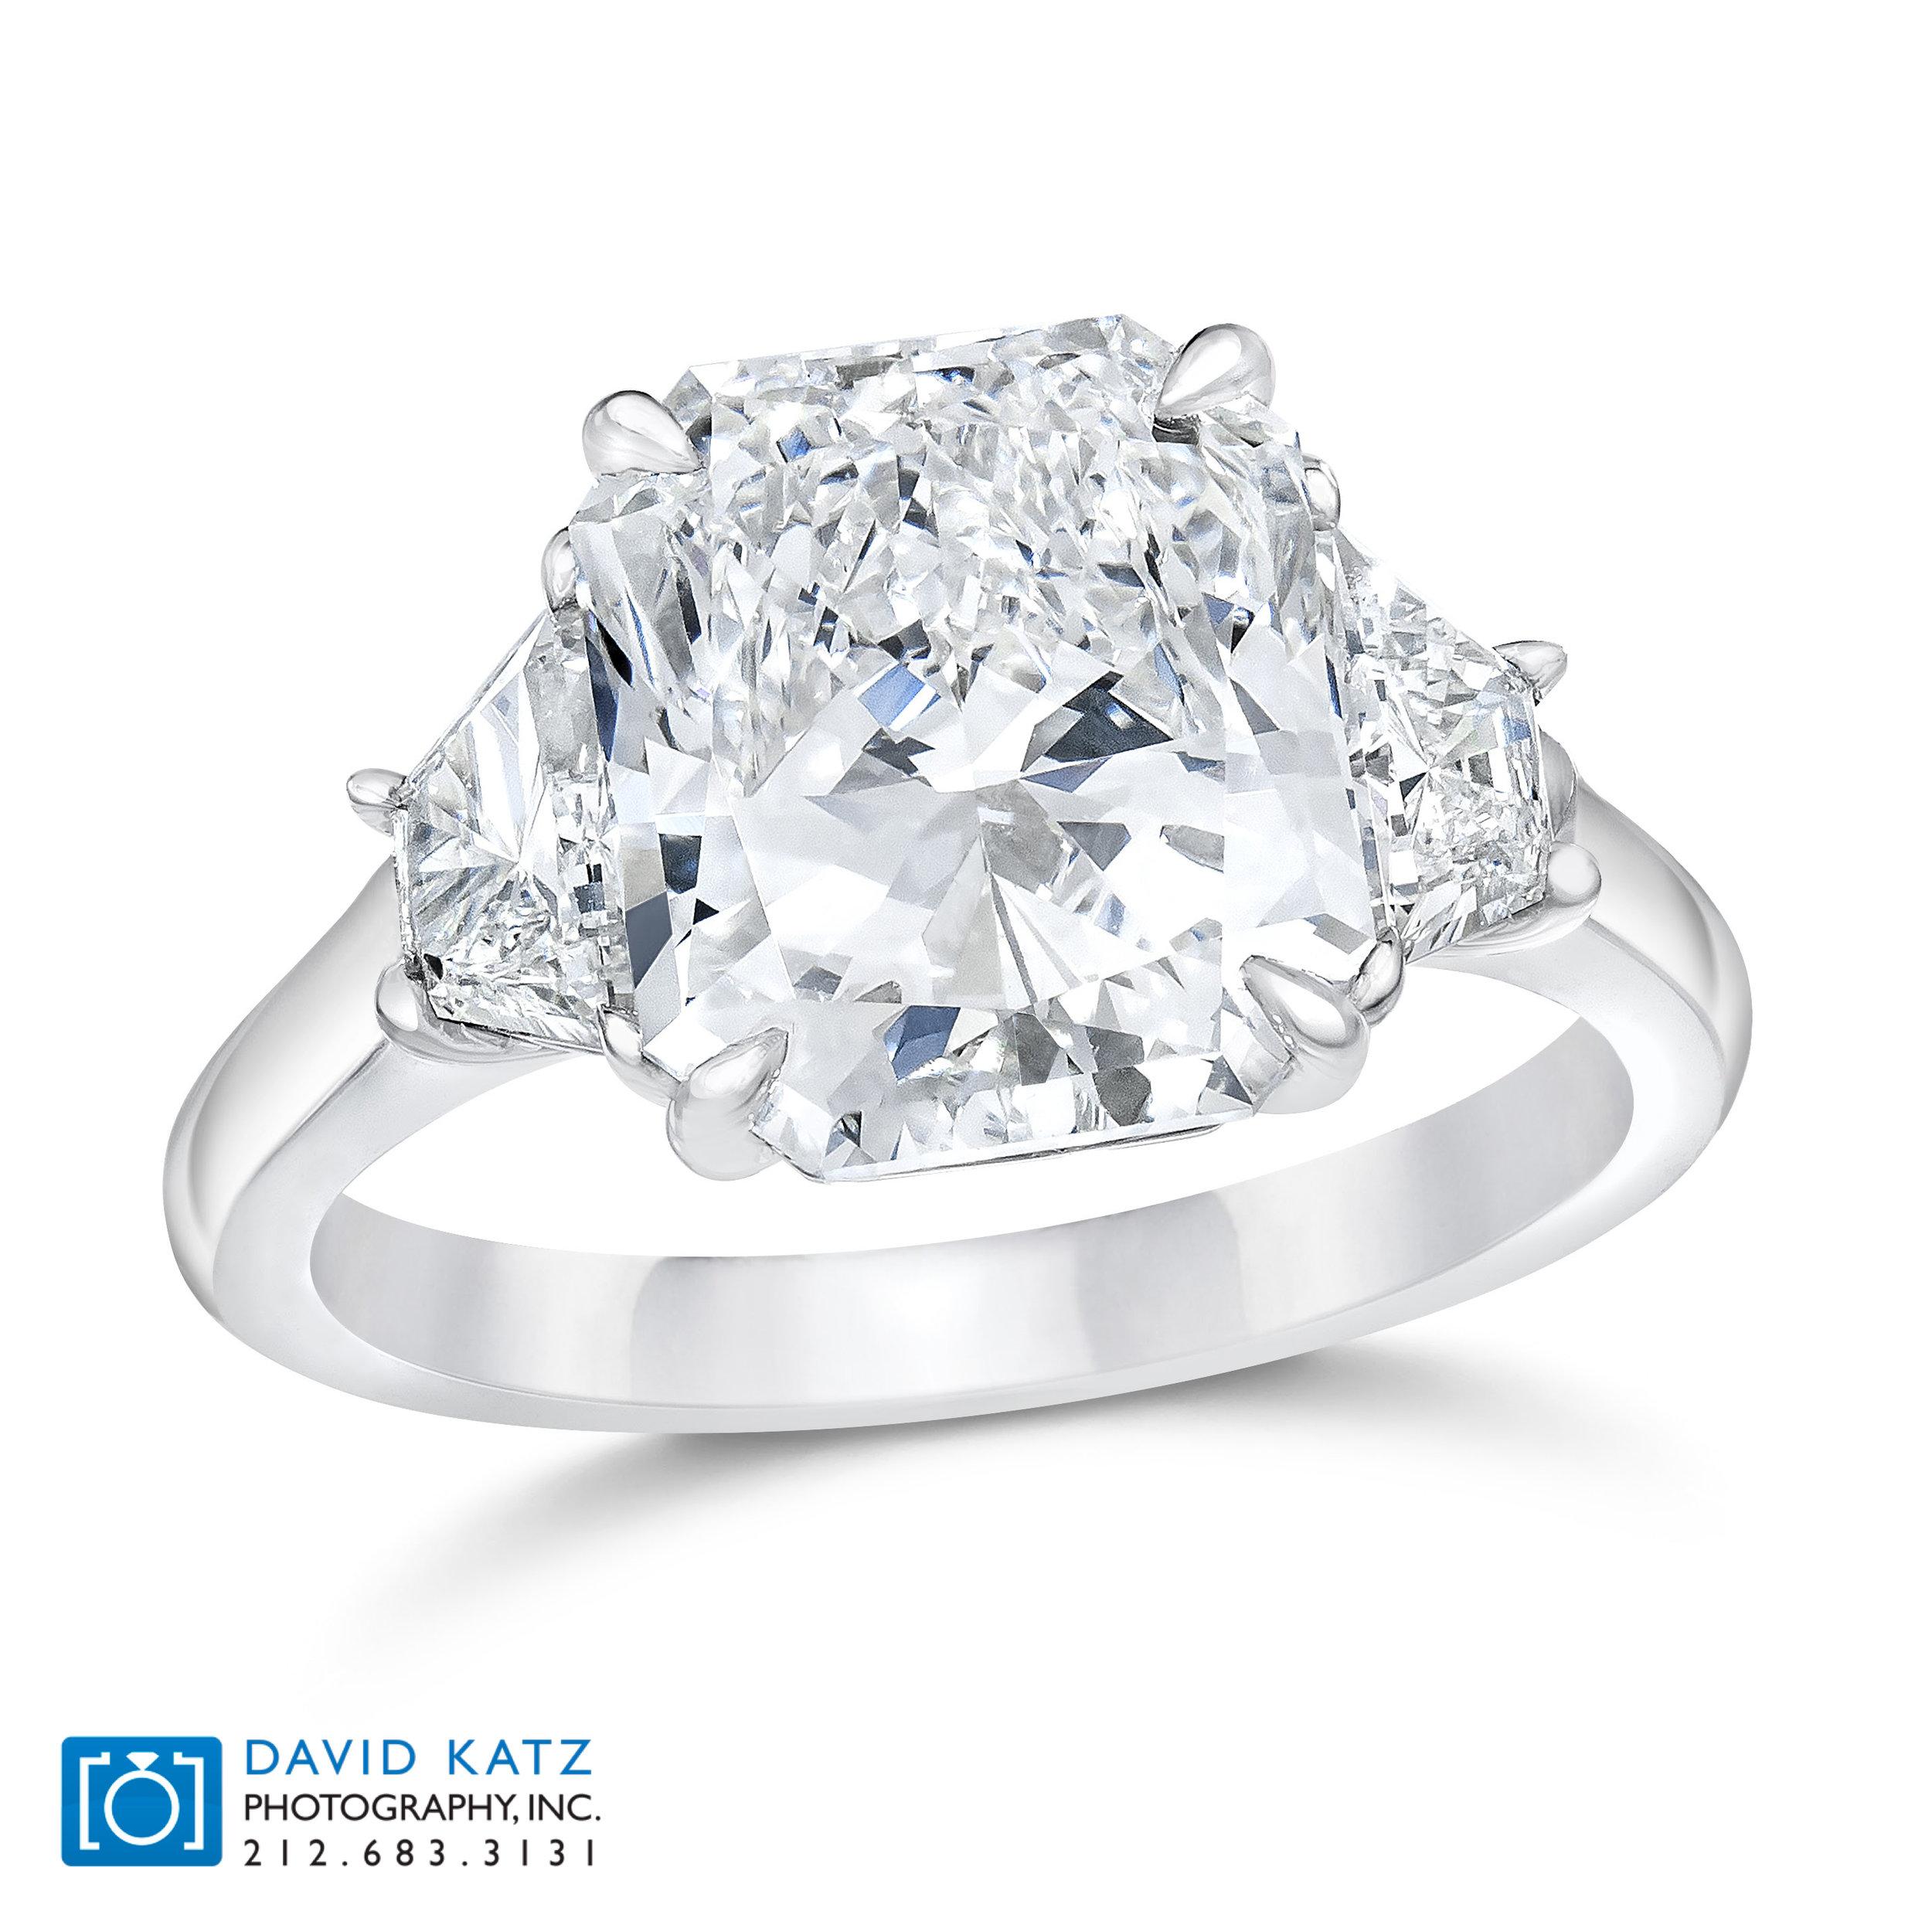 Radiant 3 Stone Diamond Ring Standing.jpg